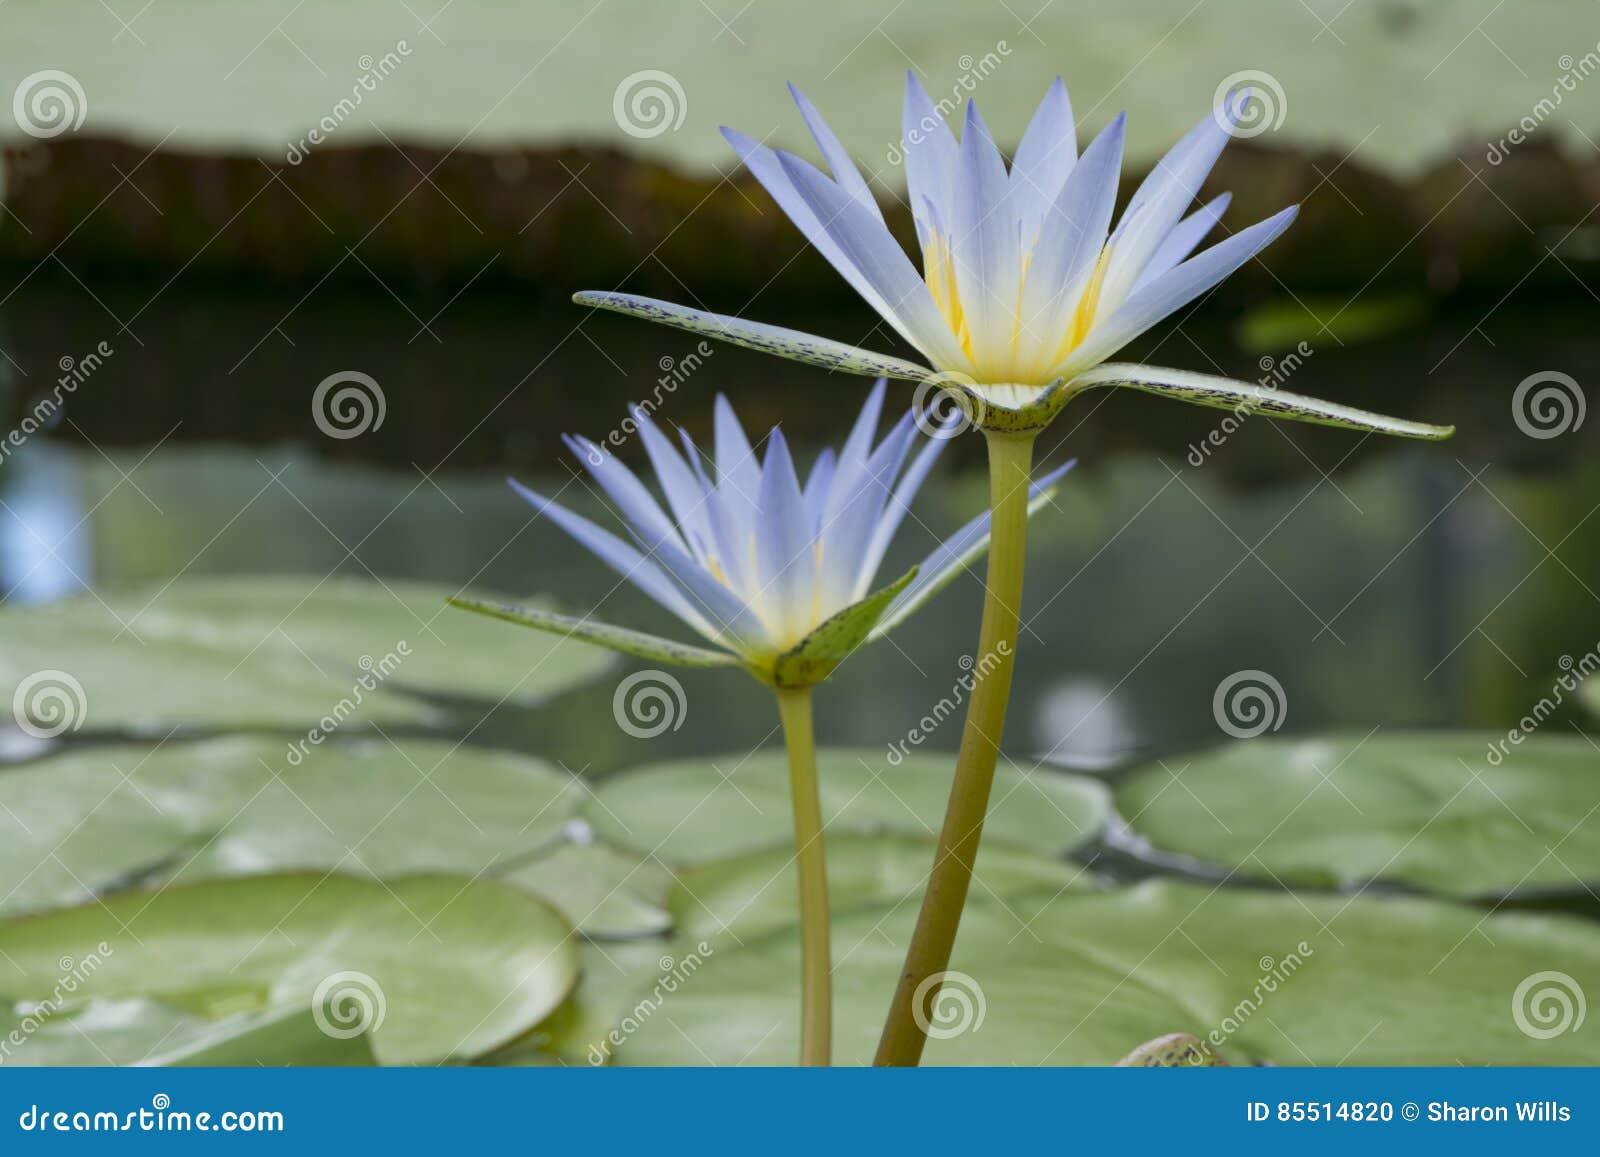 Two Nymphaea Caerulea Blue Lotus Of Egypt Stock Photo Image Of